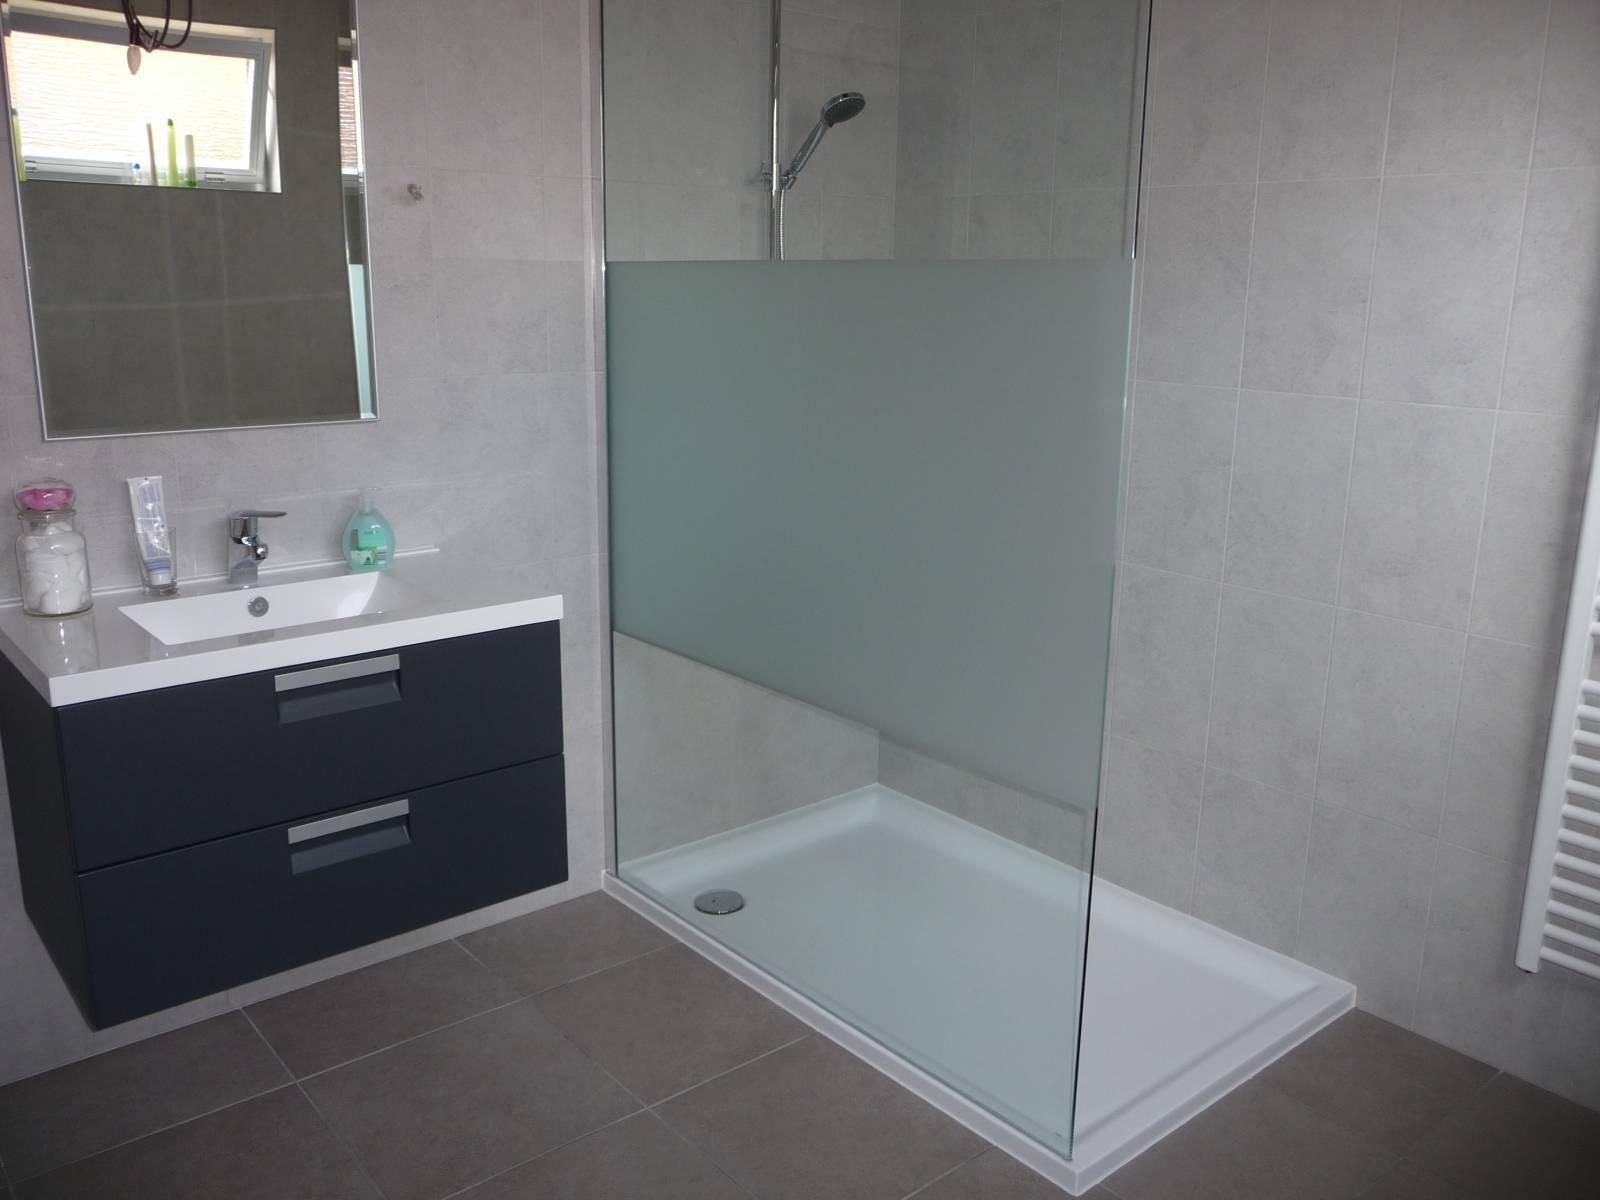 Sanitair - Bijvoorbeeld vlak badkamer ...